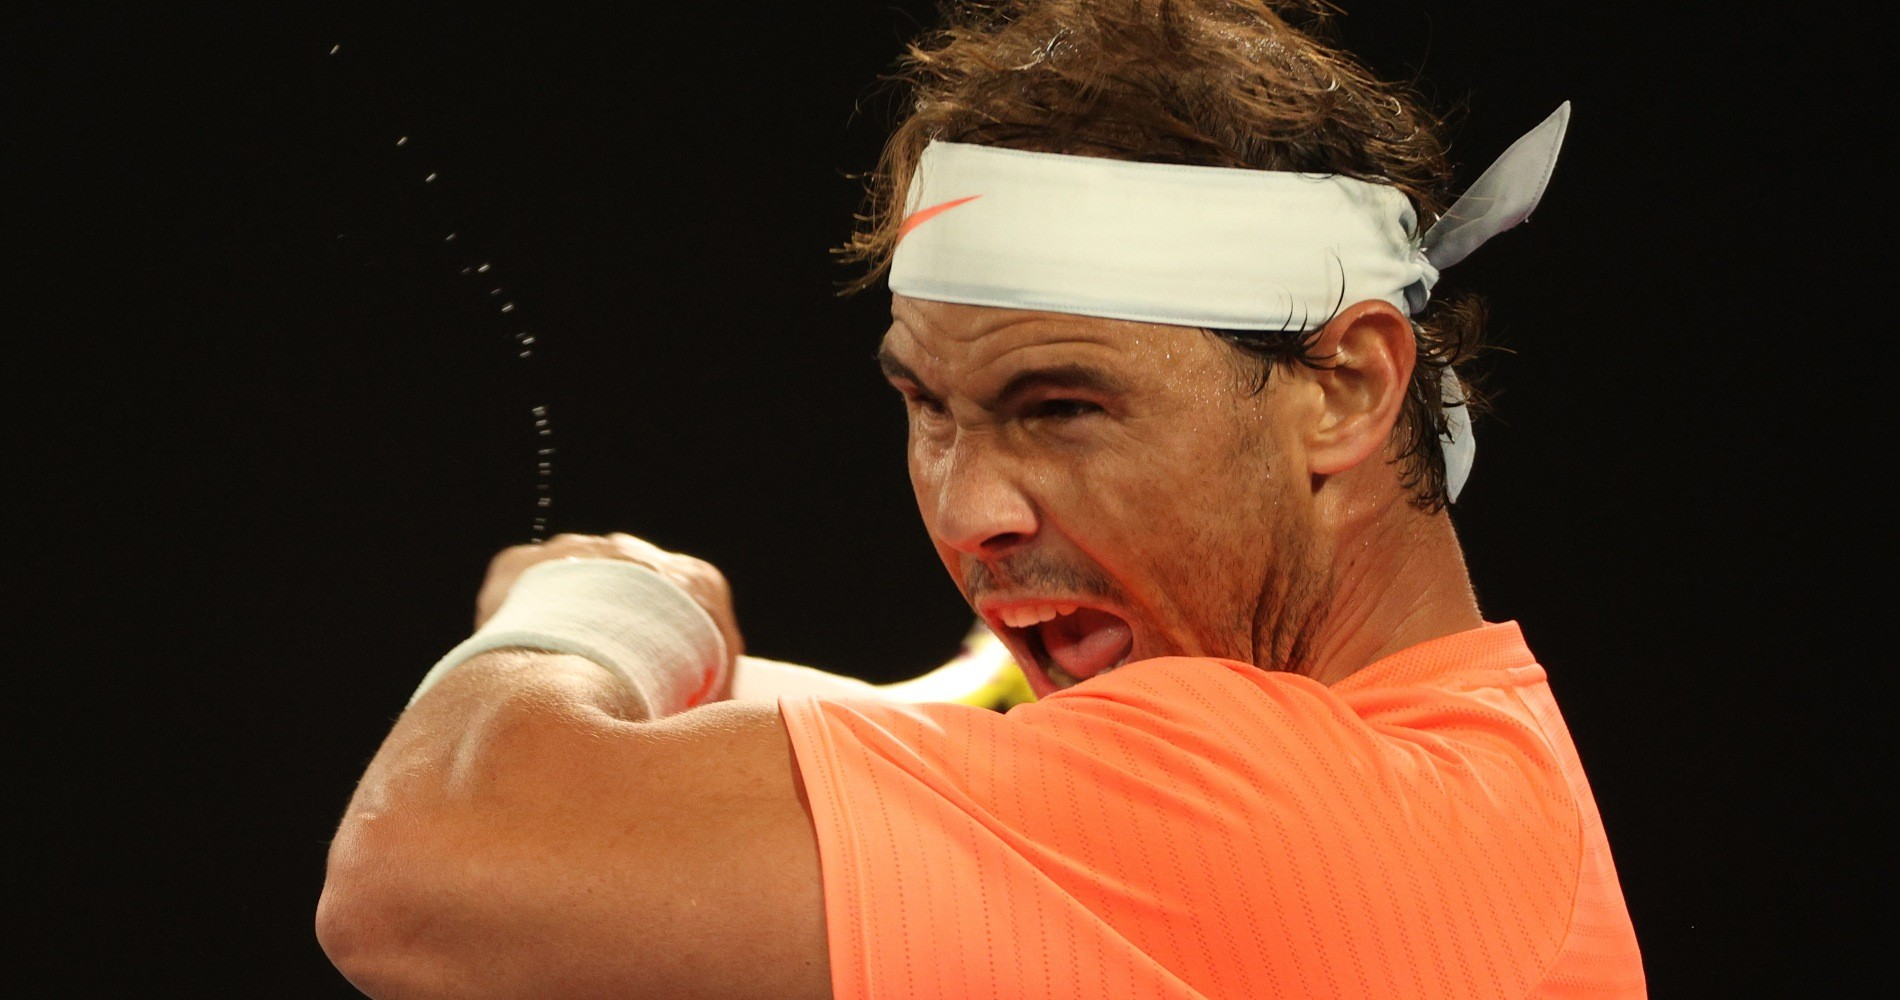 Rafael Nadal Aus Open R3 2021